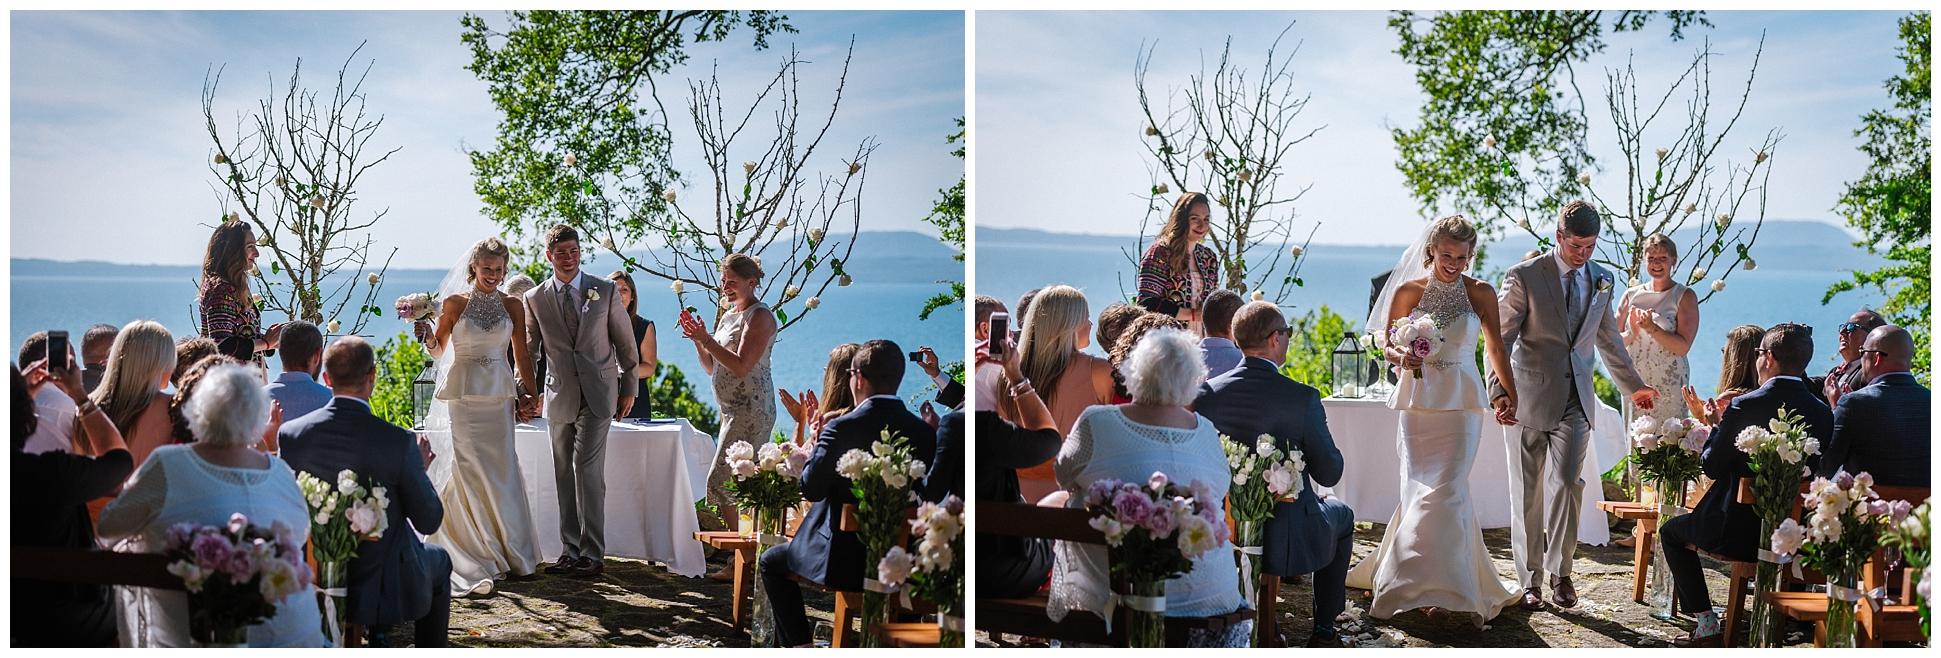 Cheilean-destination-adventure-wedding-florida-patagonia-pucon-santa-cruz-vsco_0100.jpg